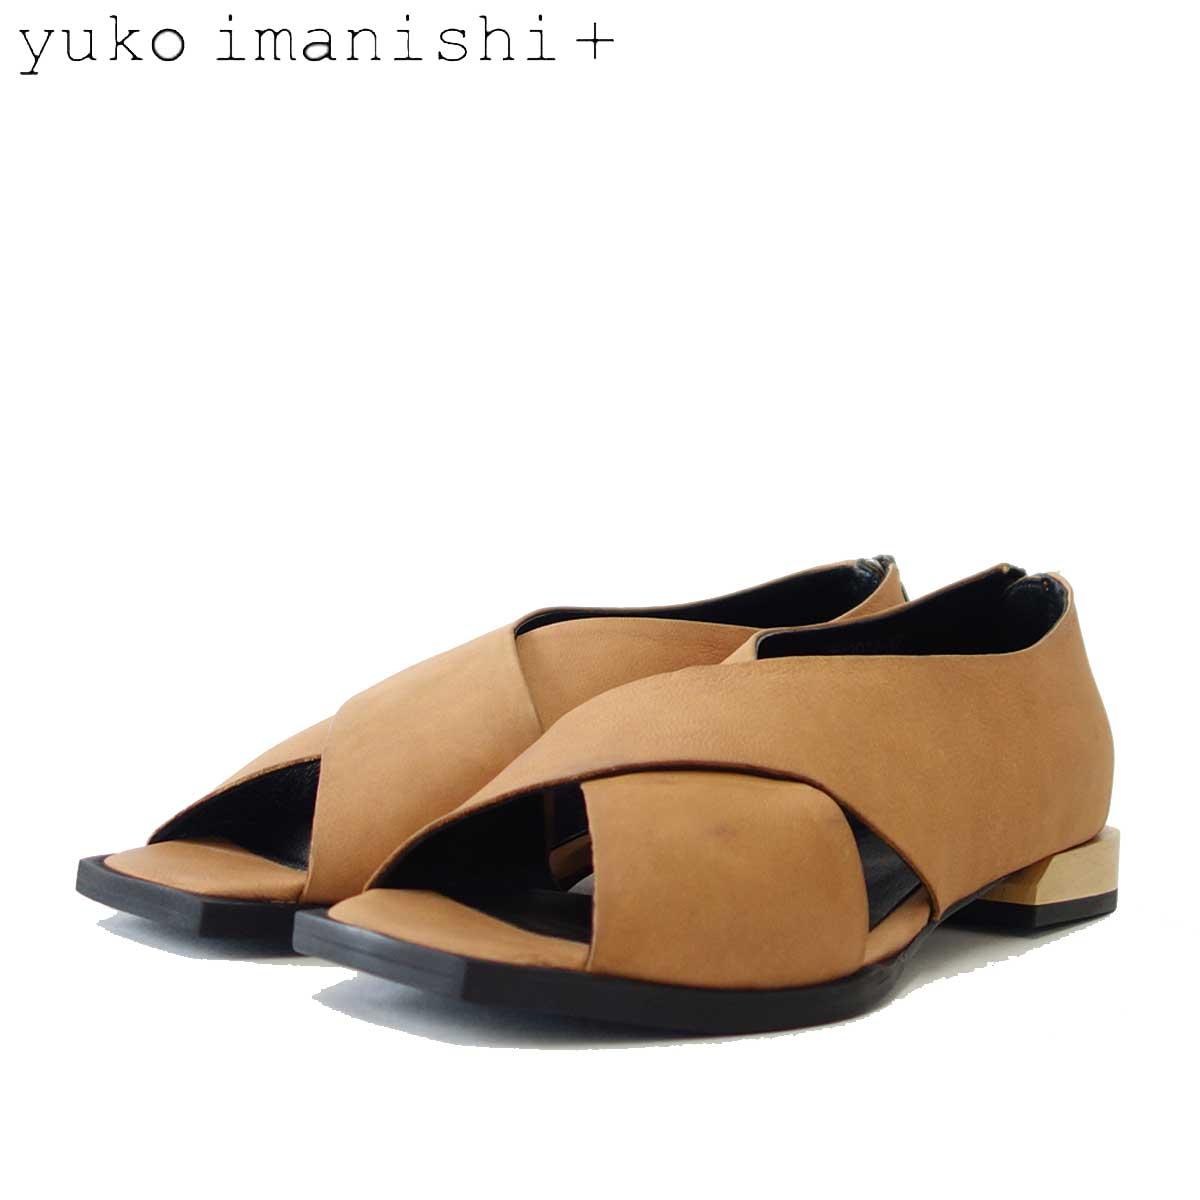 yuko imanishi + ユーコ イマニシ+ 792014 ブラウン クロスベルトのオープントゥカッターシューズ 「靴」